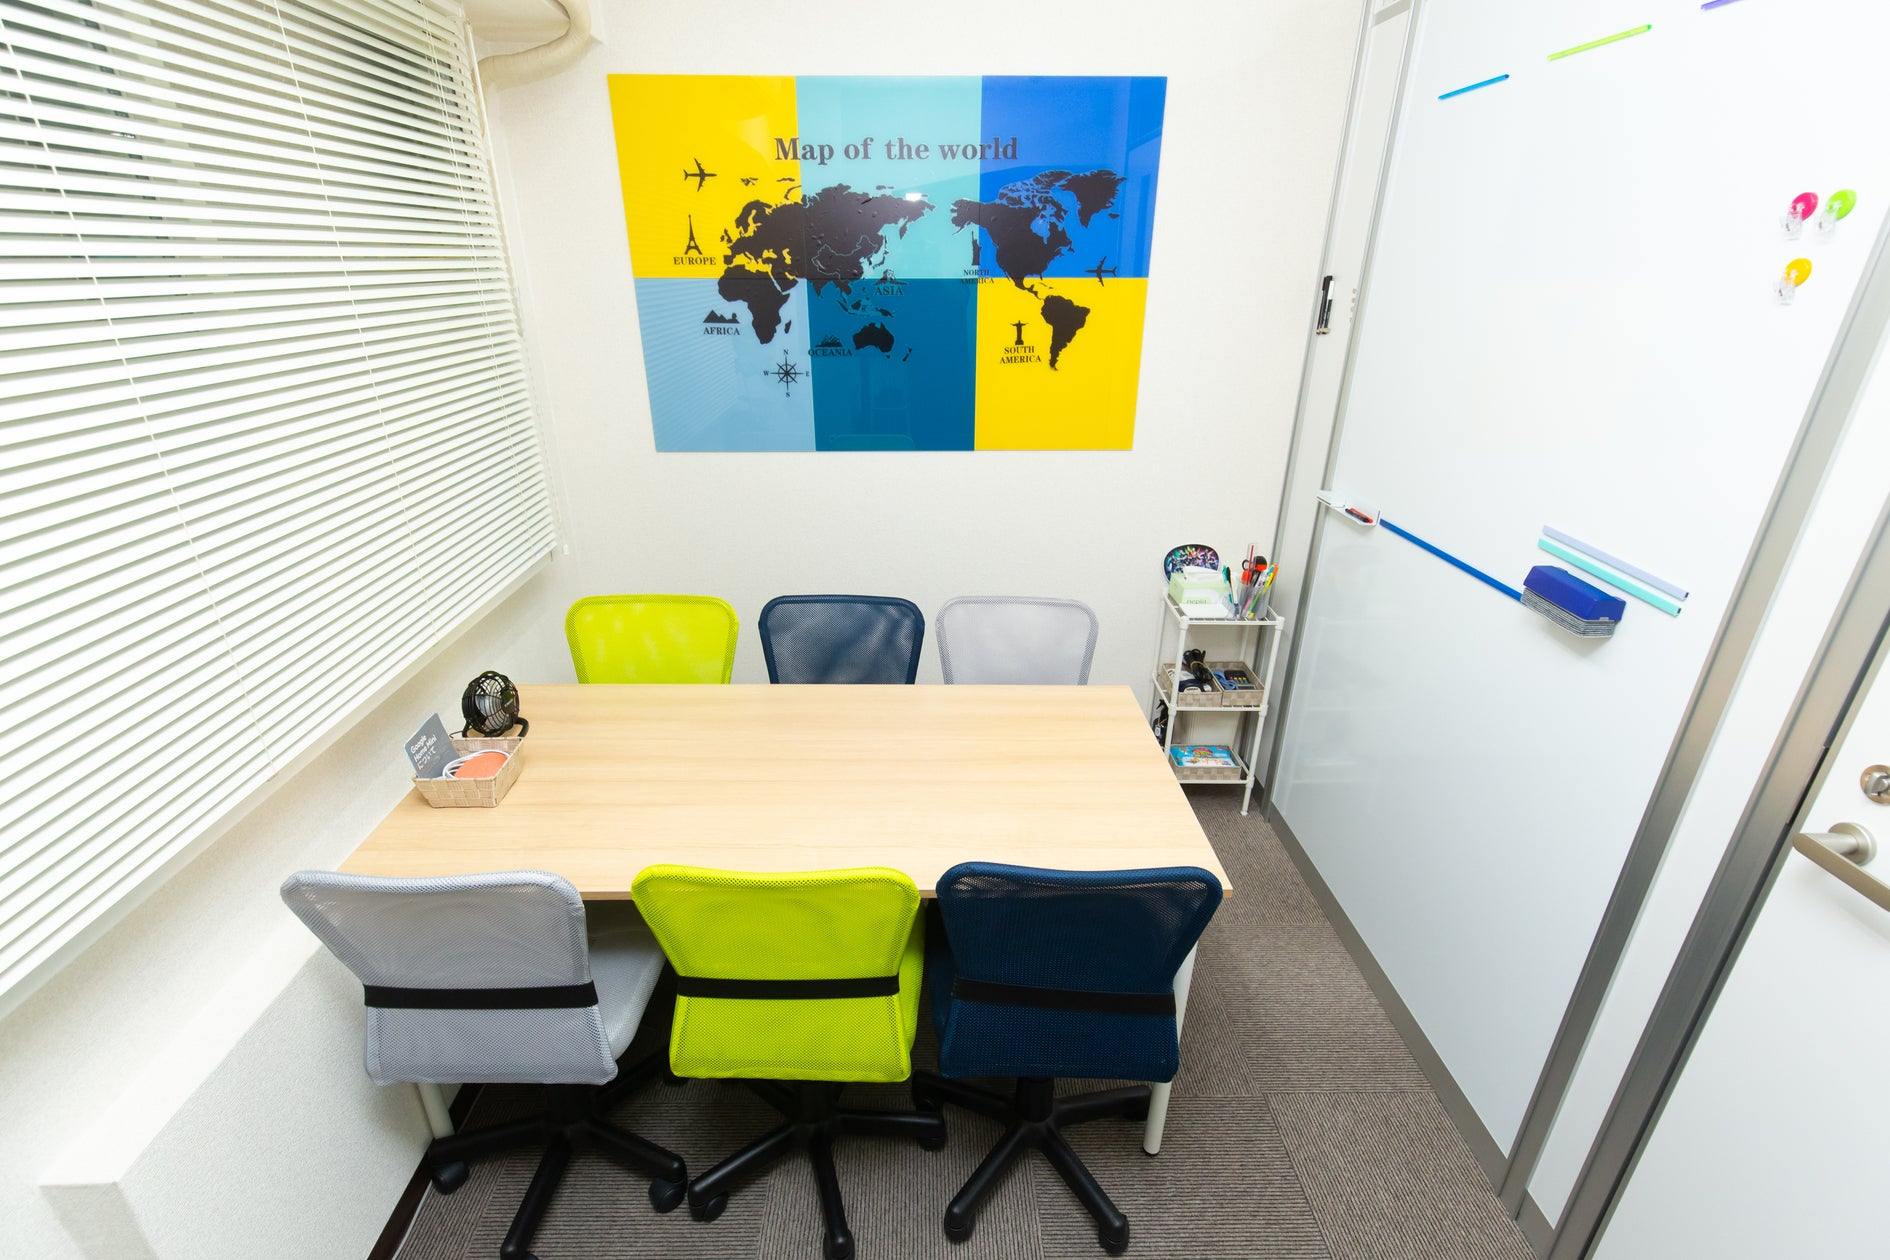 【新宿西口5分】小会議室/多目的室/2~4名最適/Wi-Fi/レッスン/TV/飲食可/OK Google/24h可 の写真